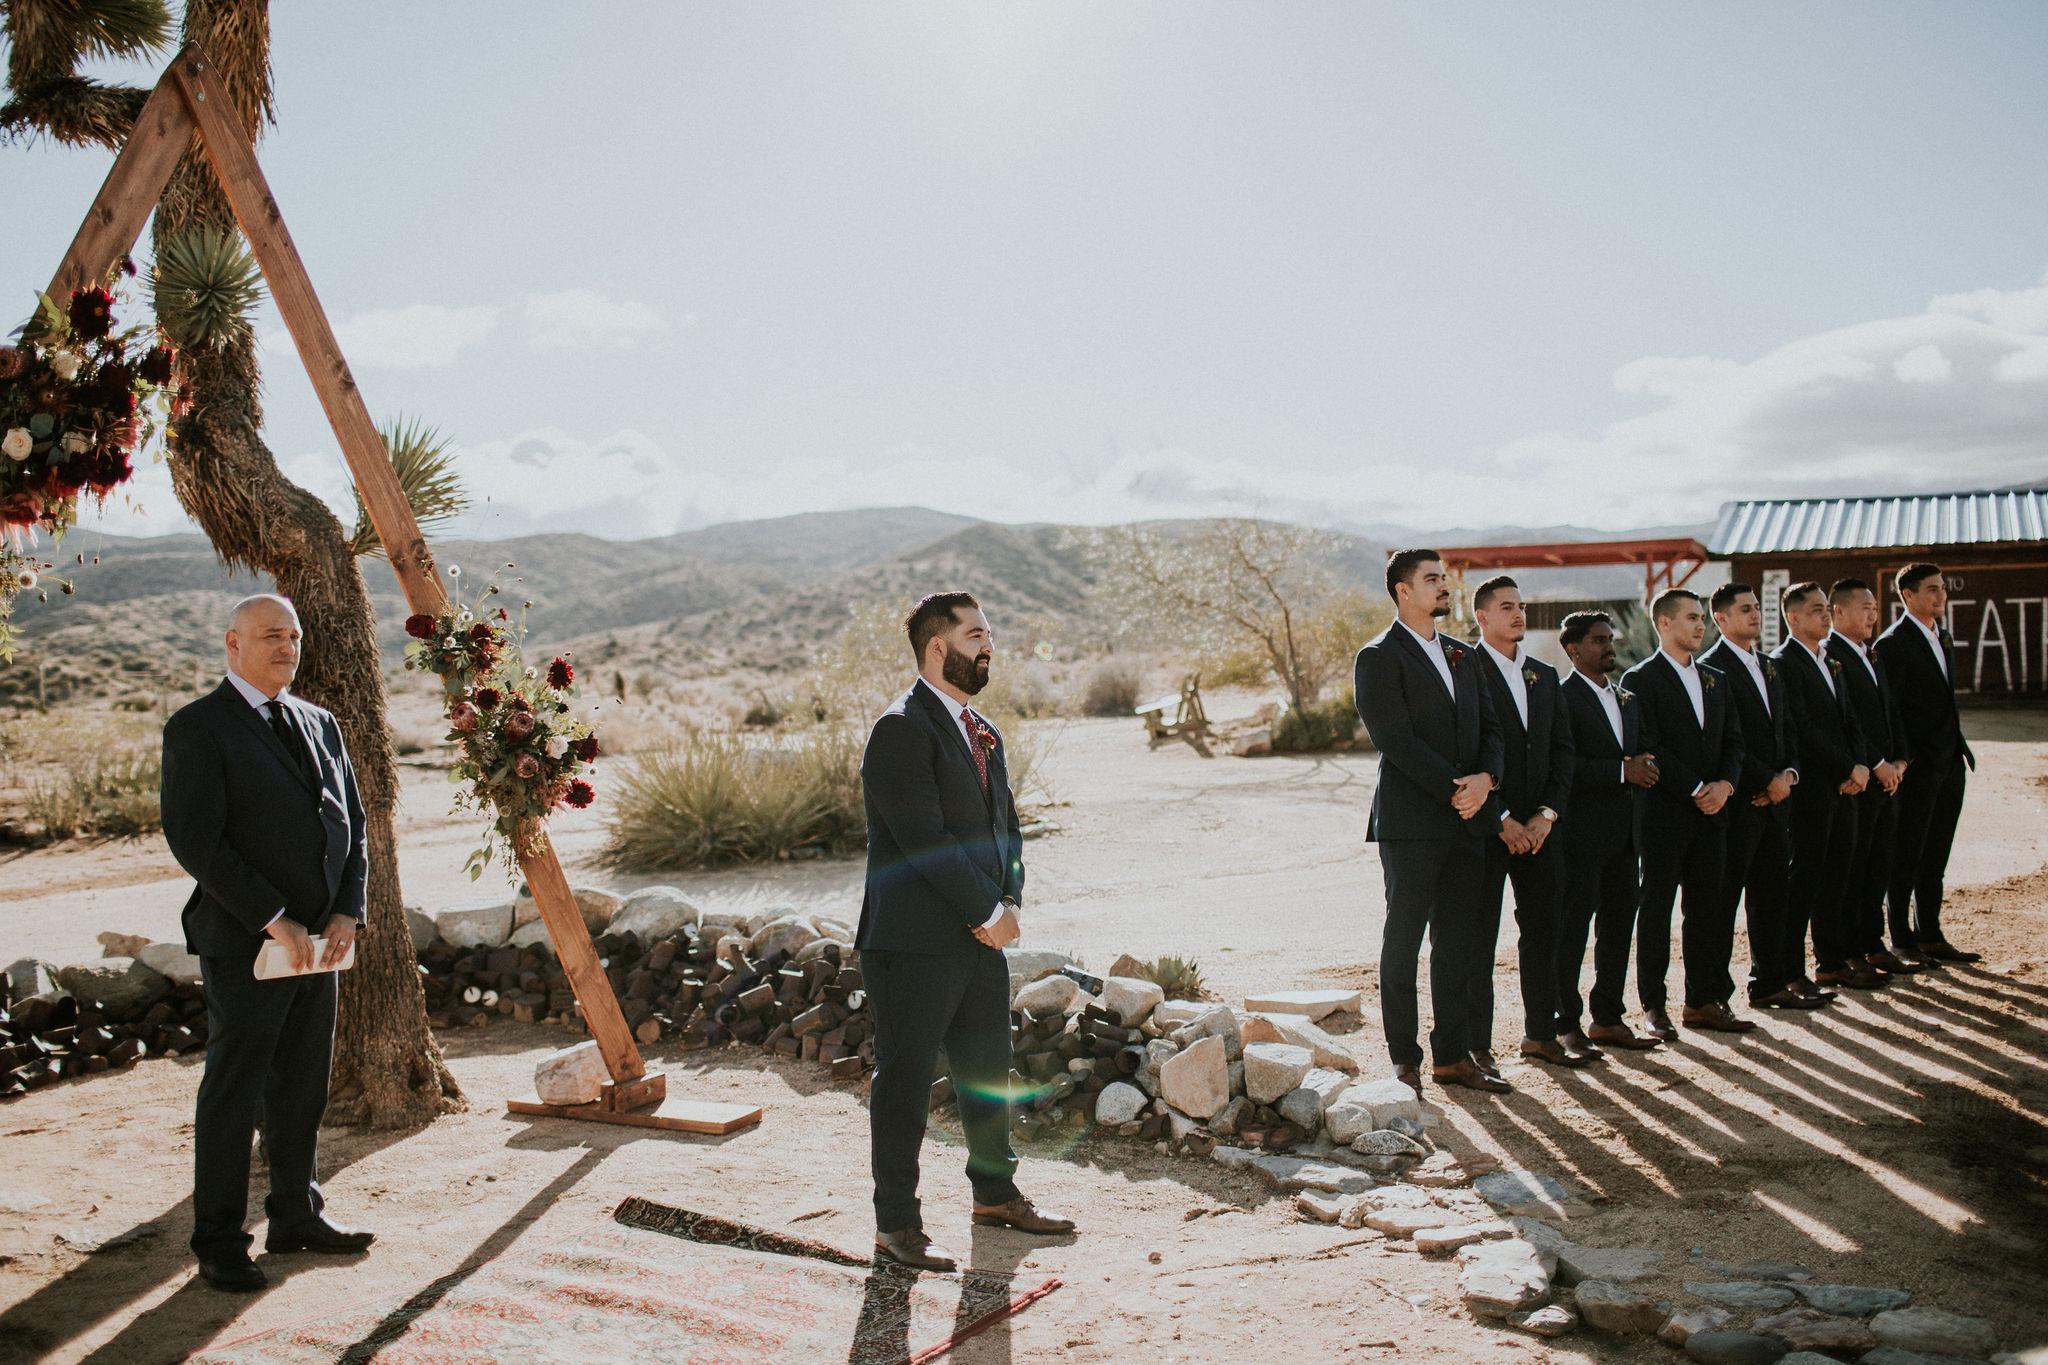 RimrockRanch-JoshuaTree-Wedding-Jami-Laree-259.jpg